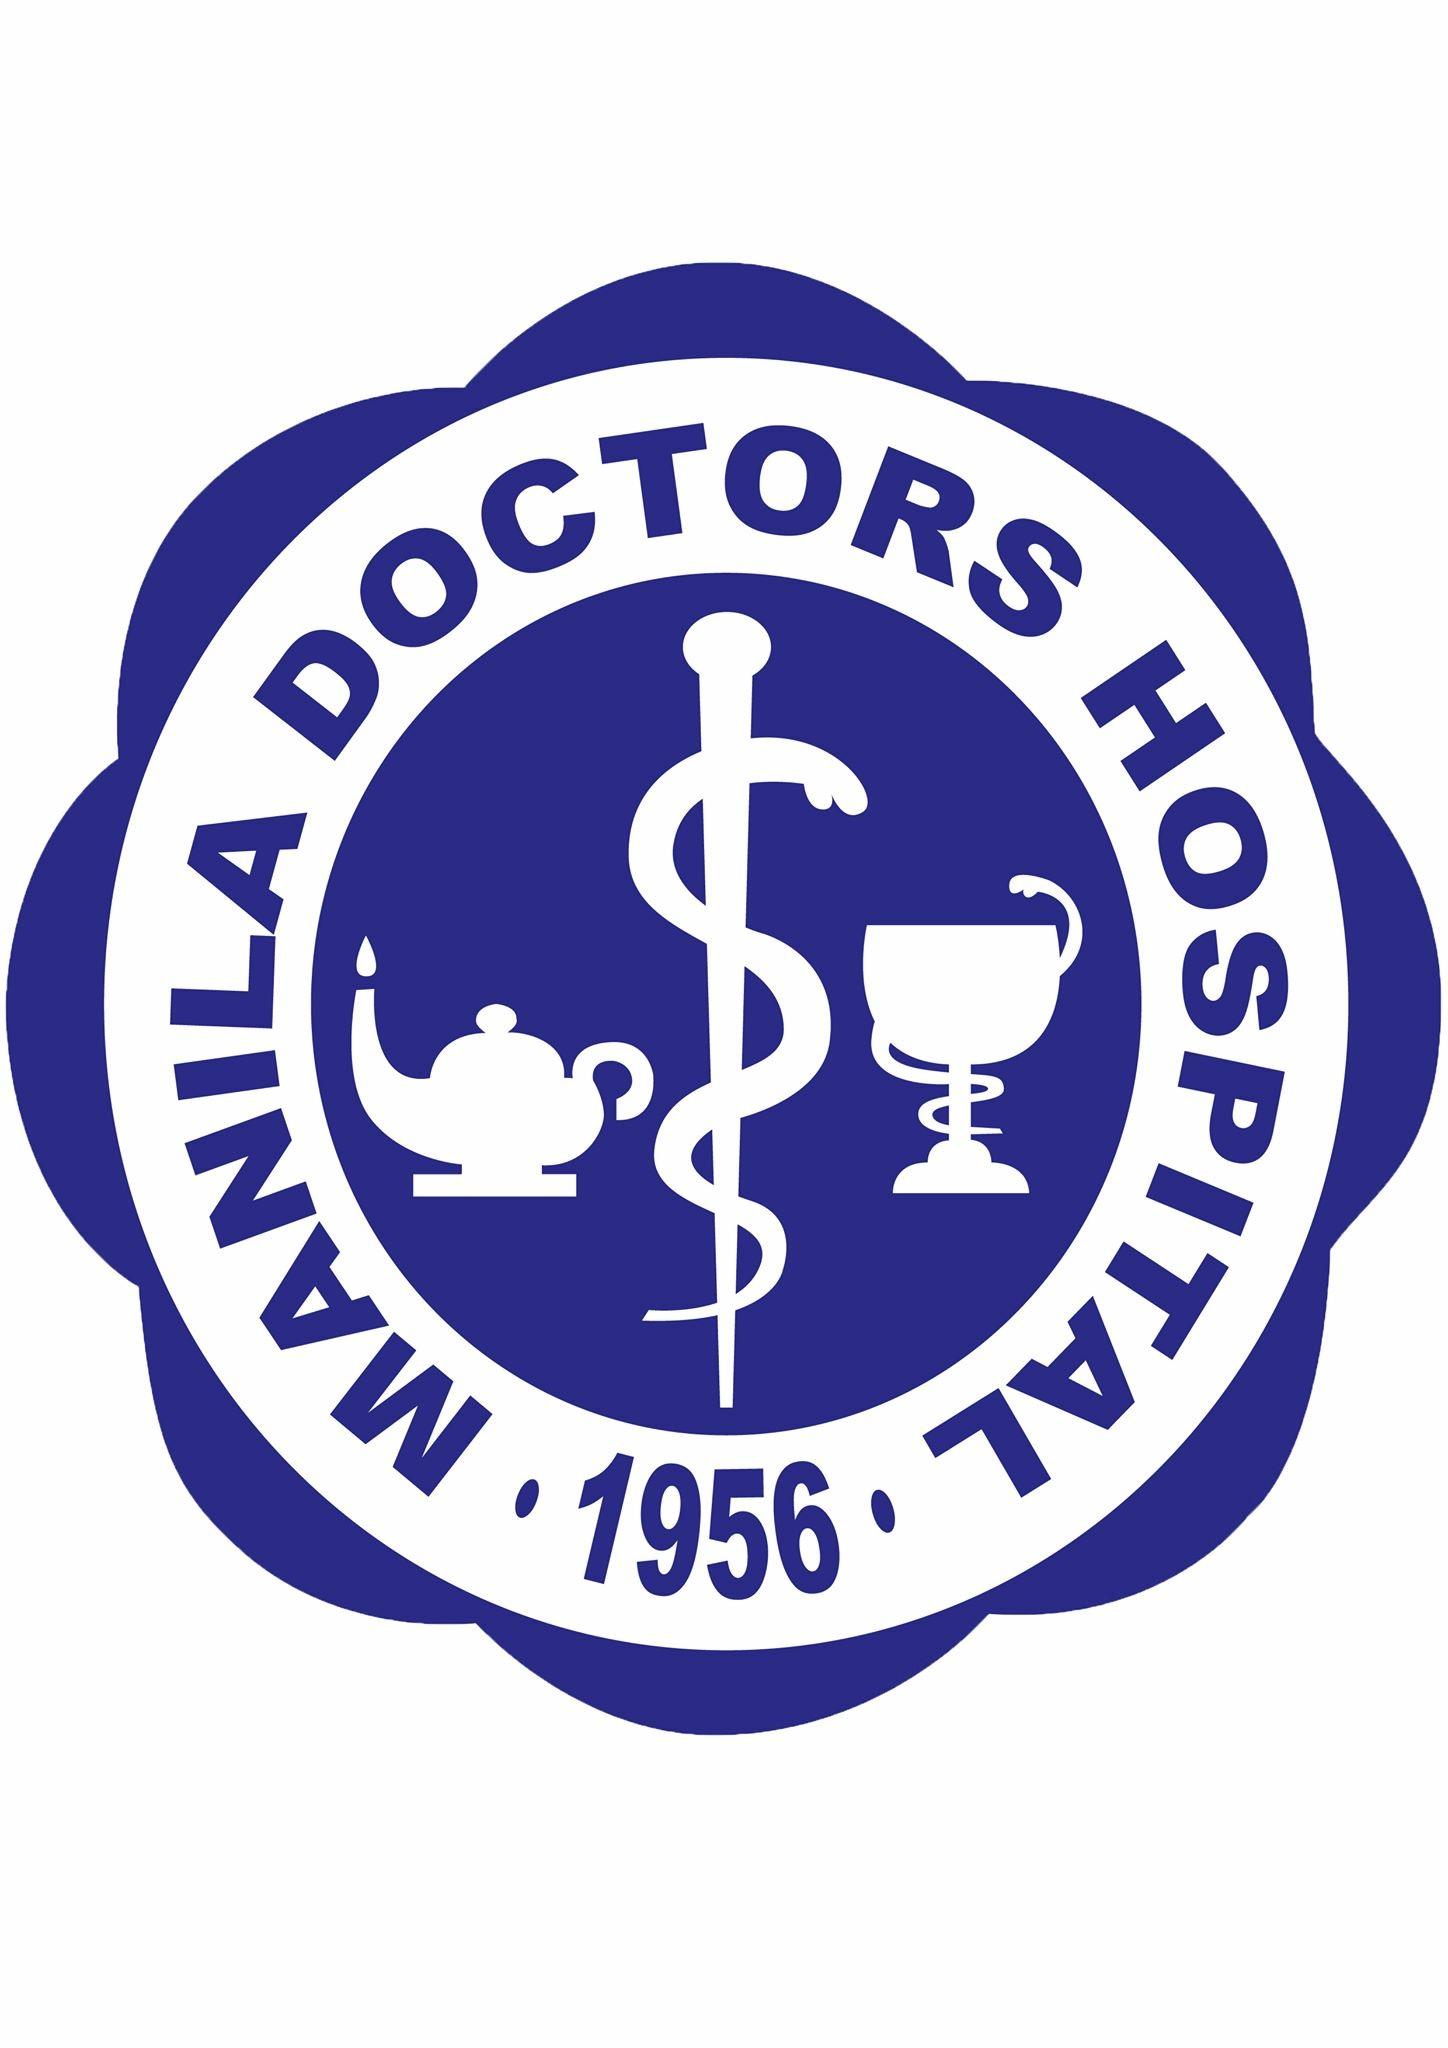 Manila Doctors Hospital - Room No. 203